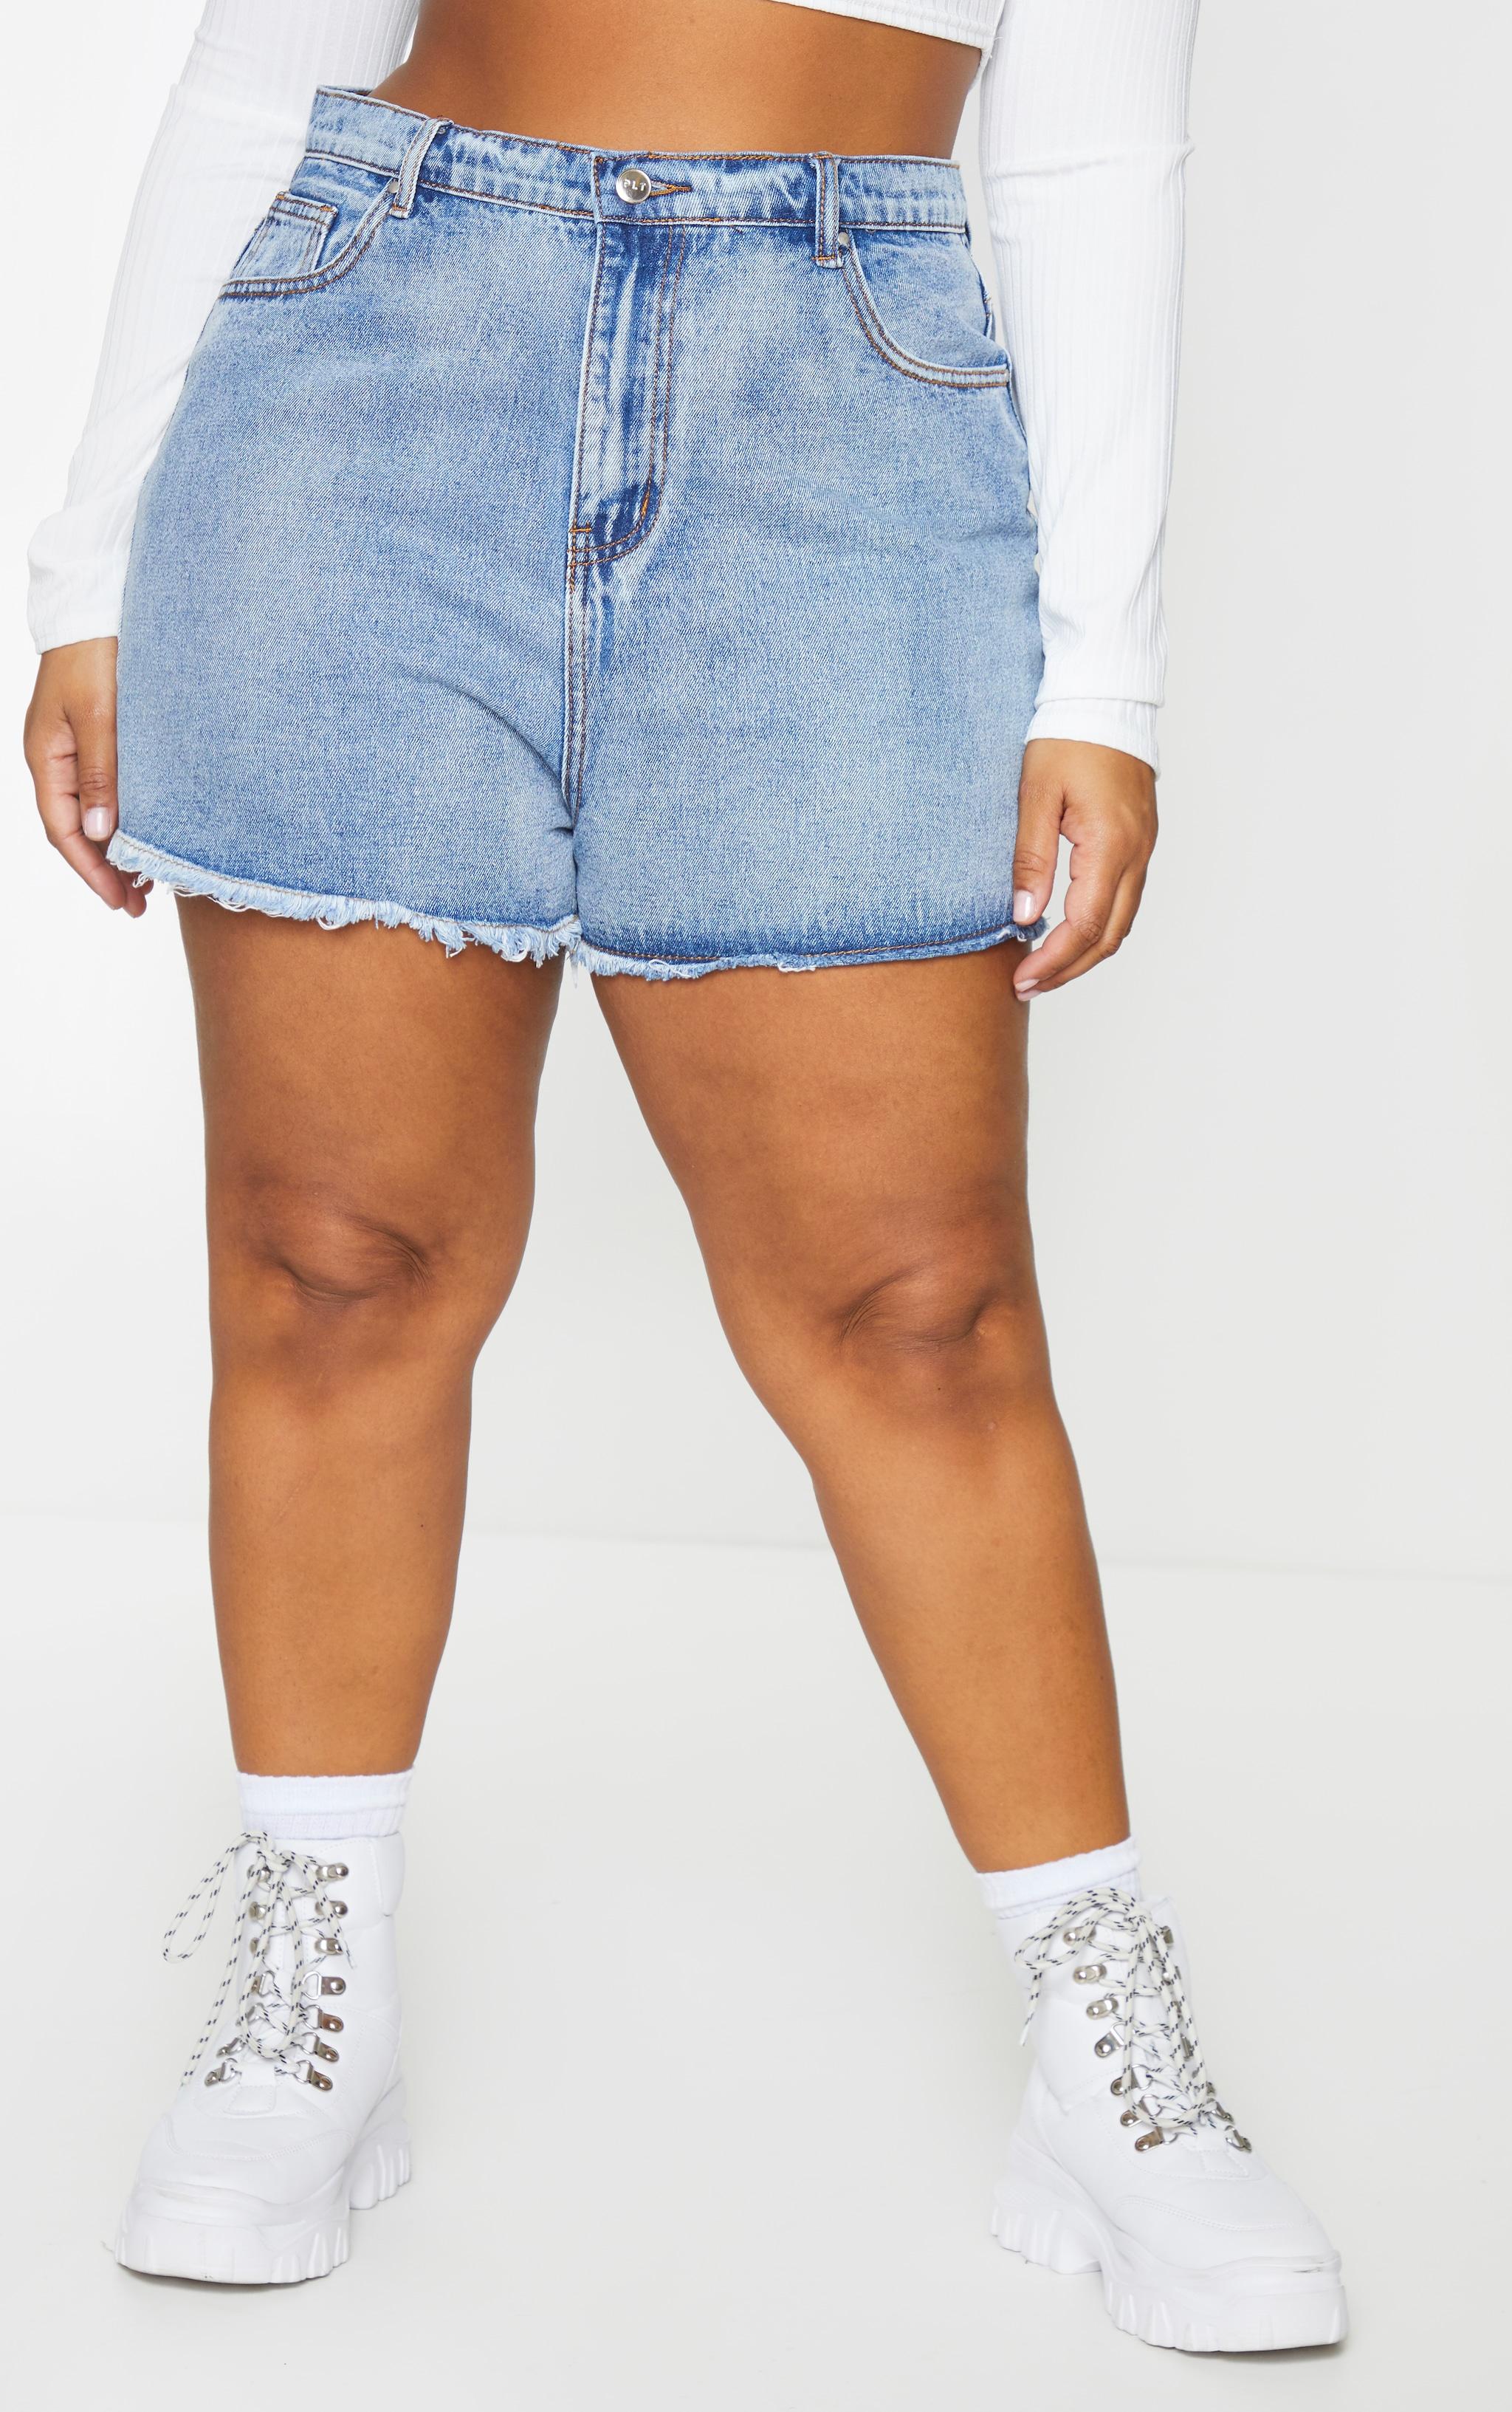 Plus Vintage High Waisted Denim Shorts 2